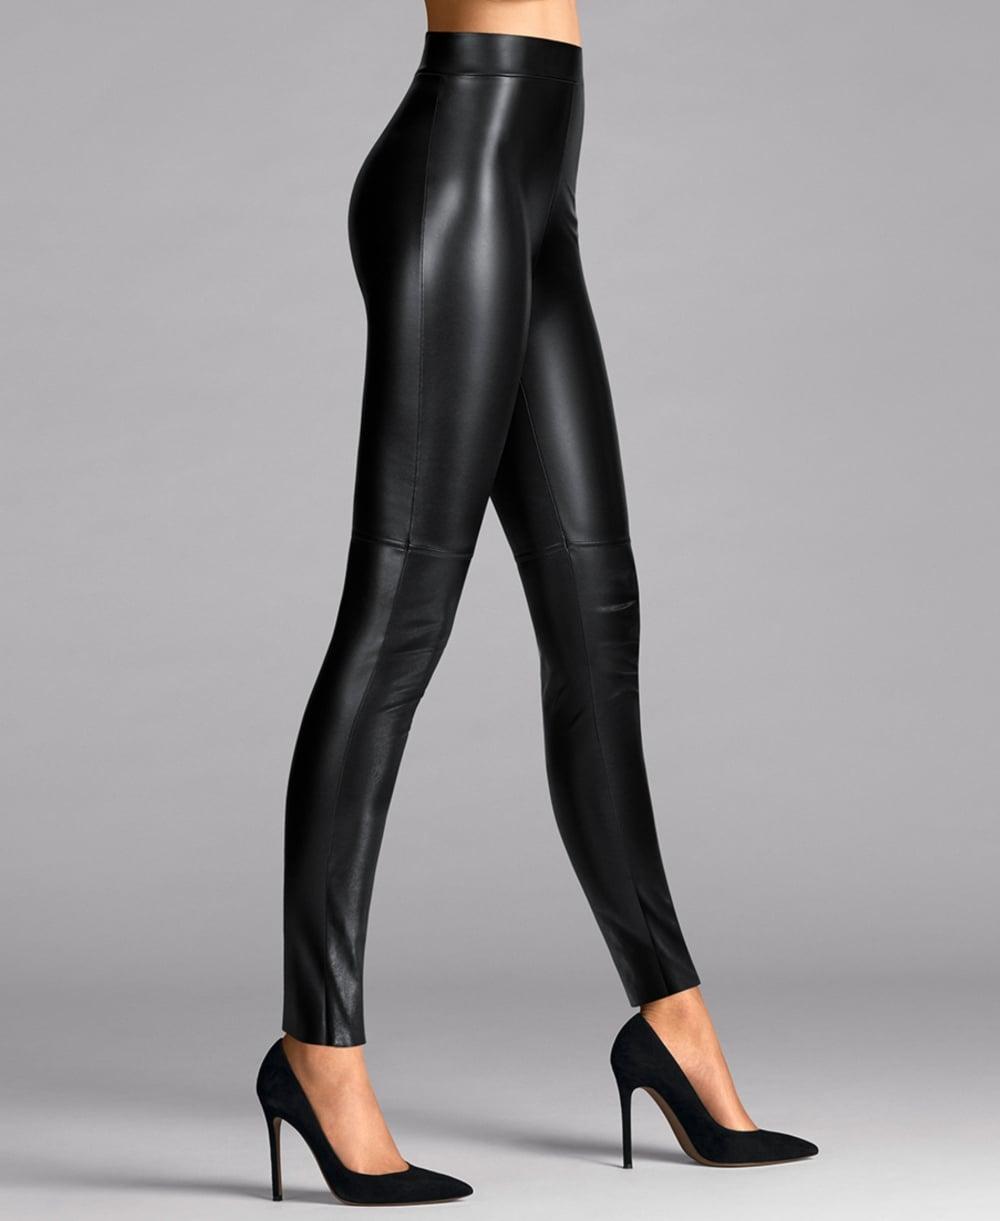 1c04c0cad Wolford Estella Leather Look Leggings - Leggings from luxury-legs.com UK